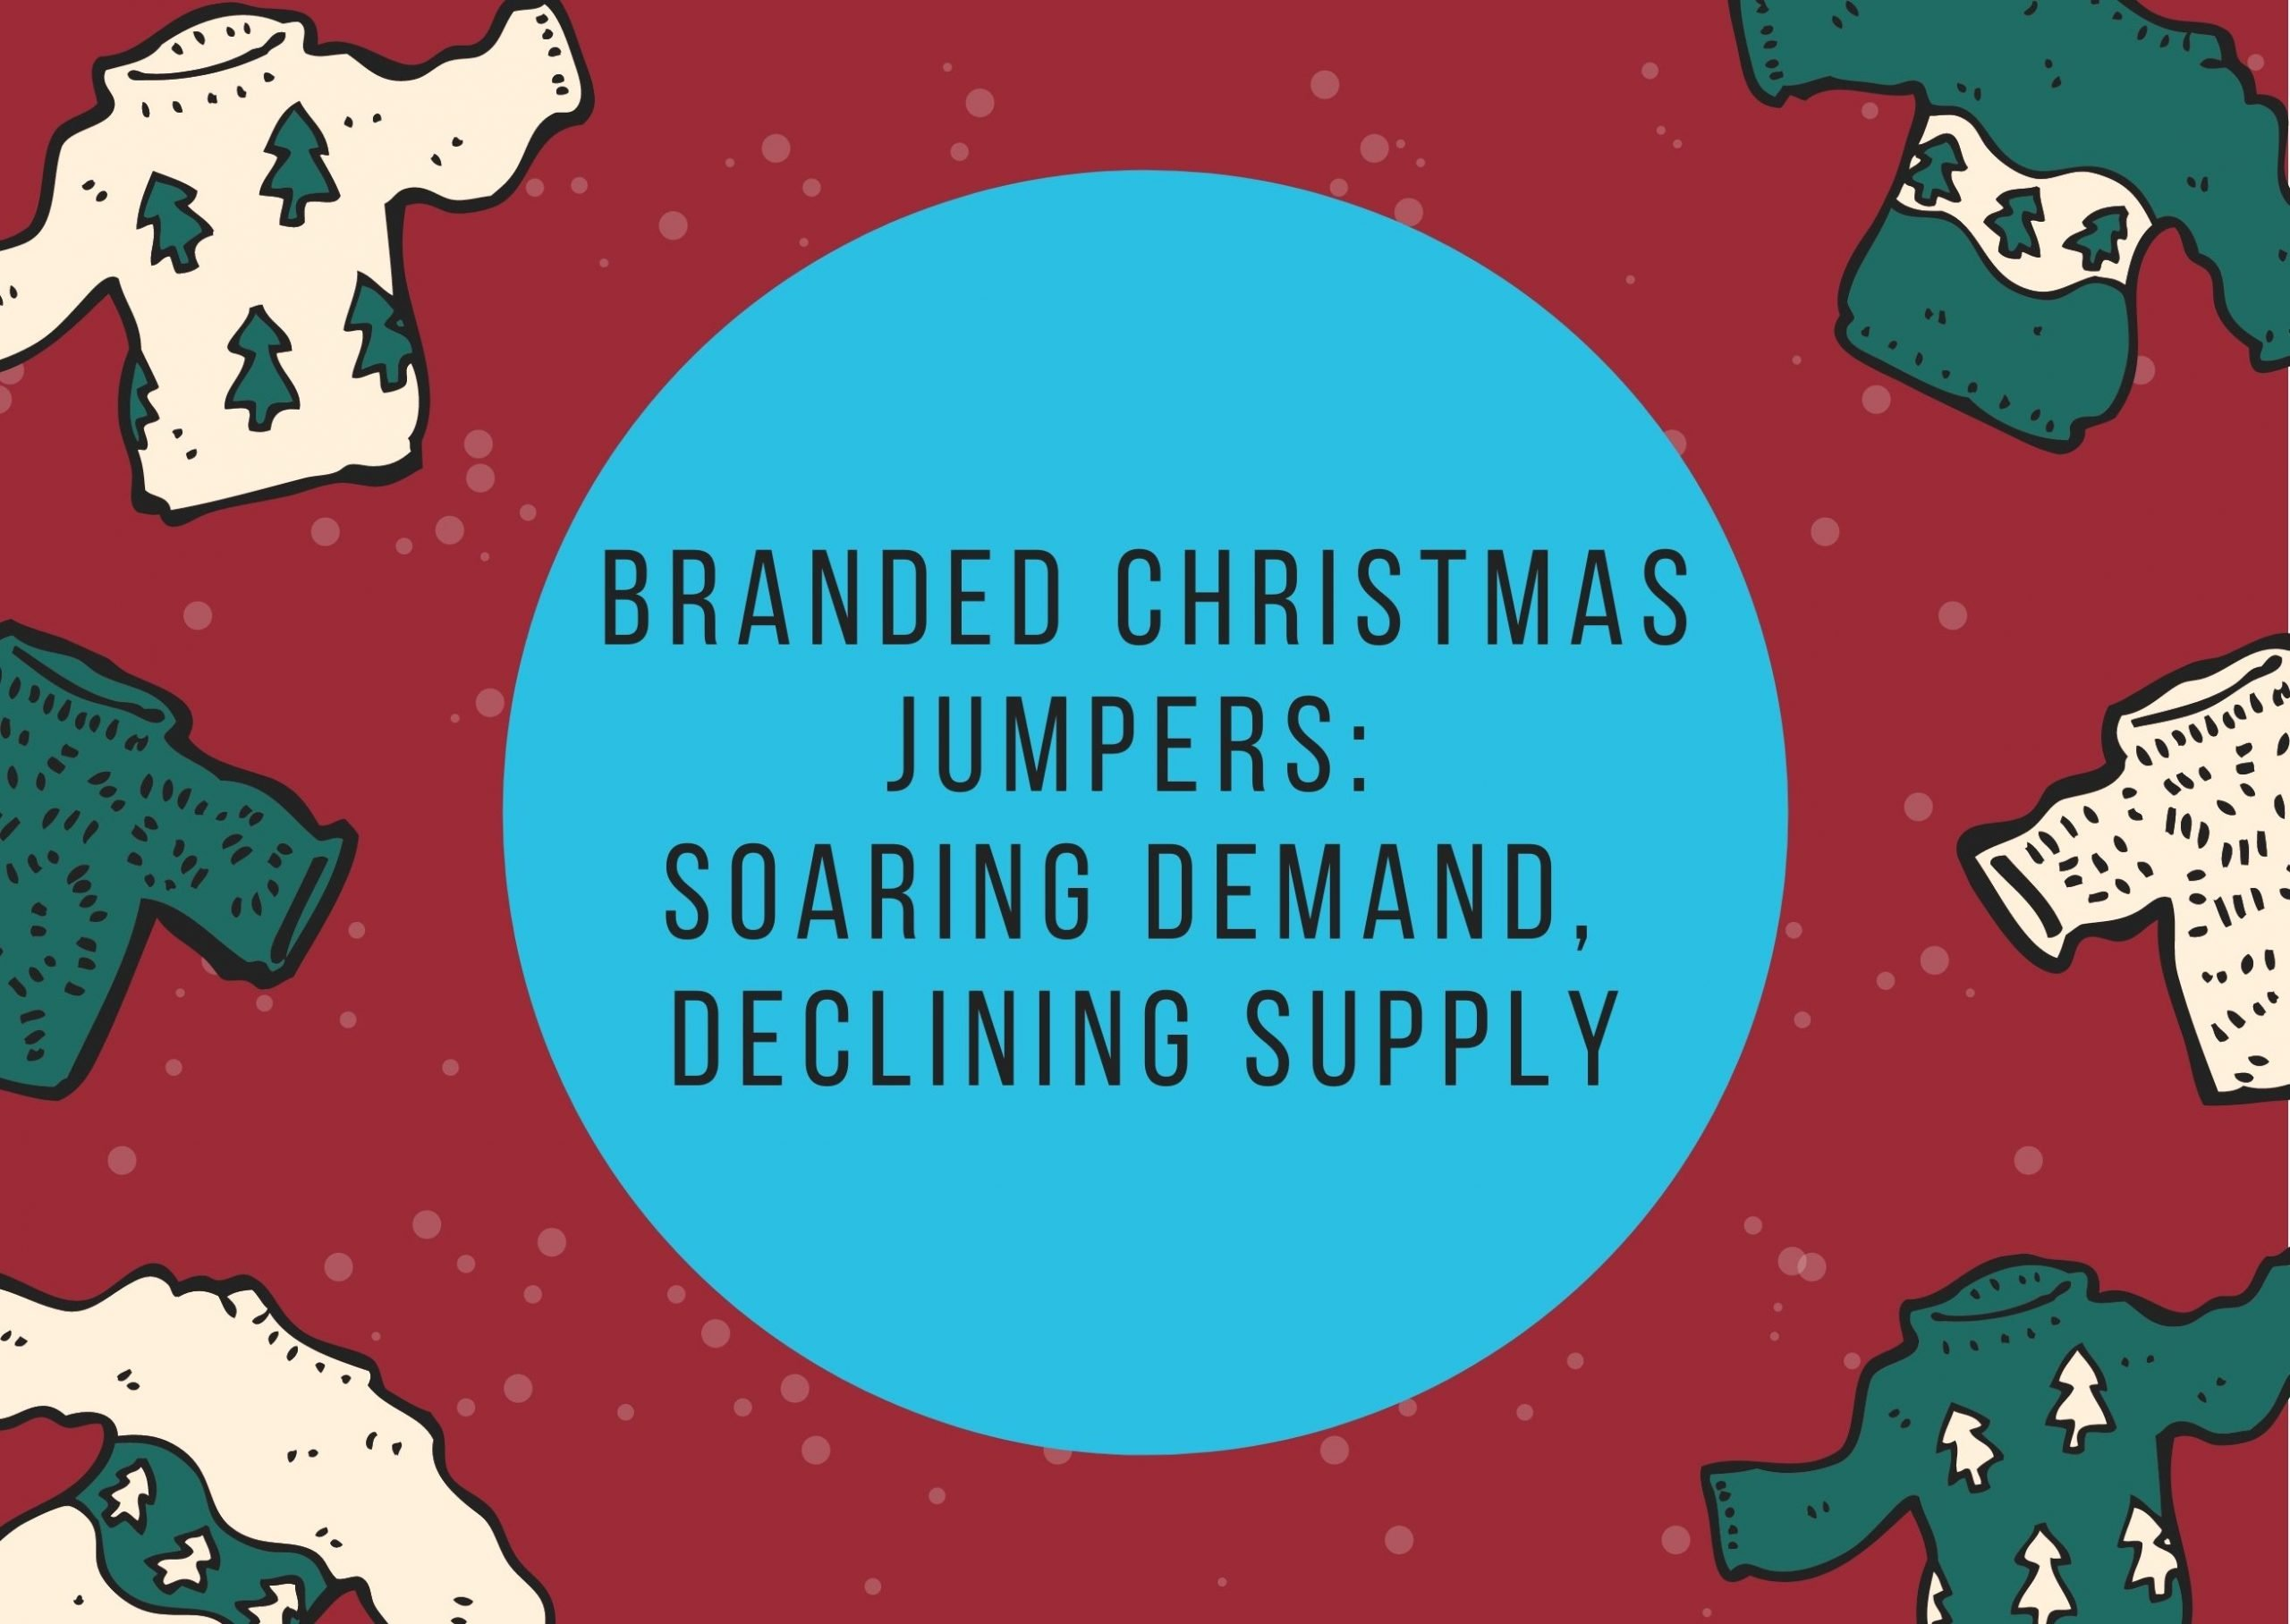 Branded Christmas jumpers header image